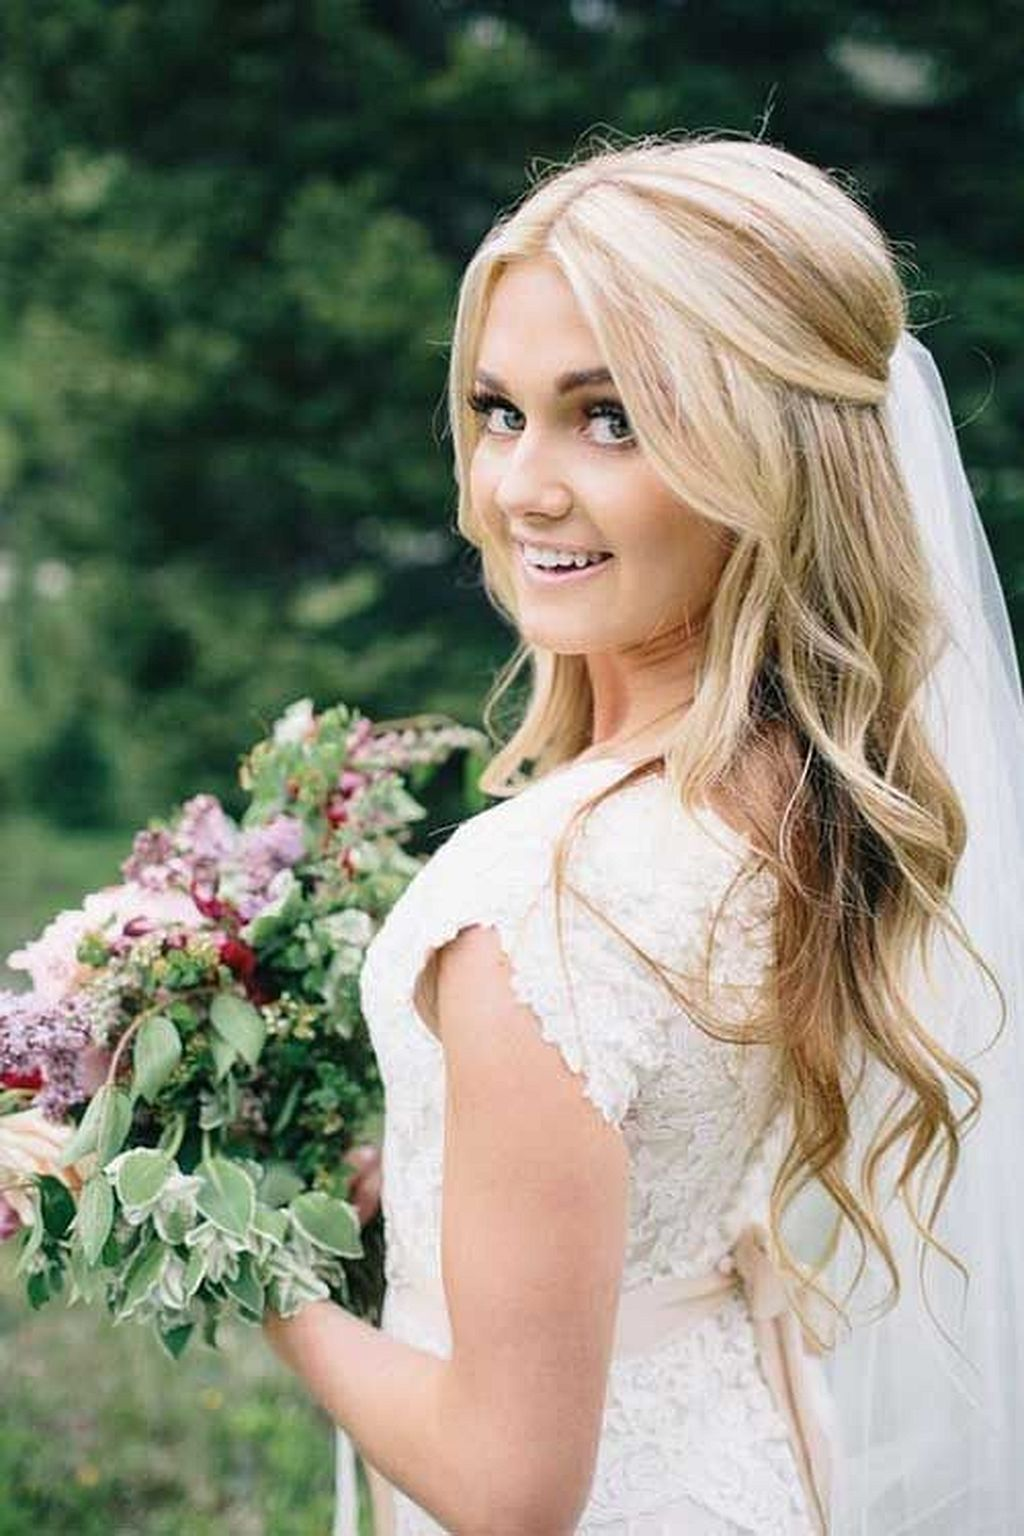 gorgeous 40 wedding hair down with veil ideas https://weddmagz